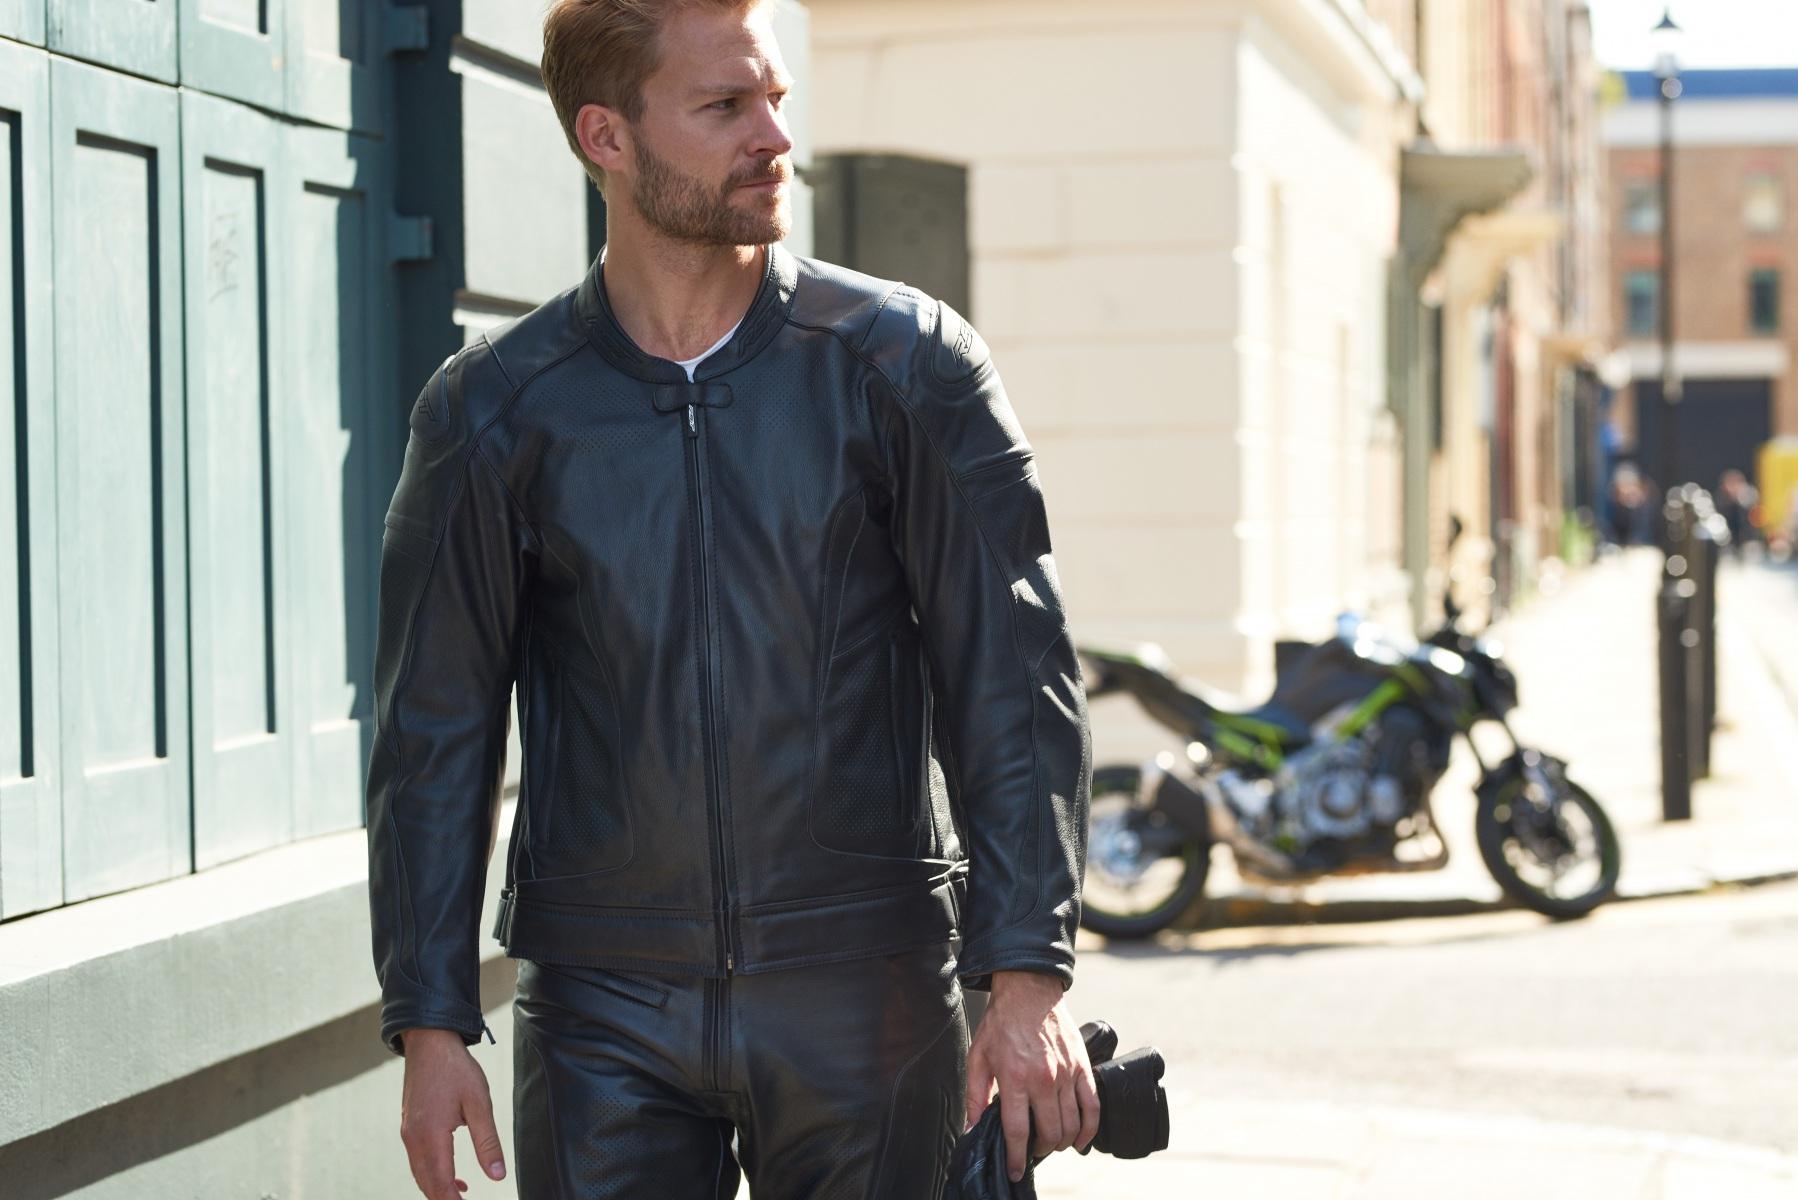 102973-rst-gt-airbag-leather-jacket-black-lifestyle-01